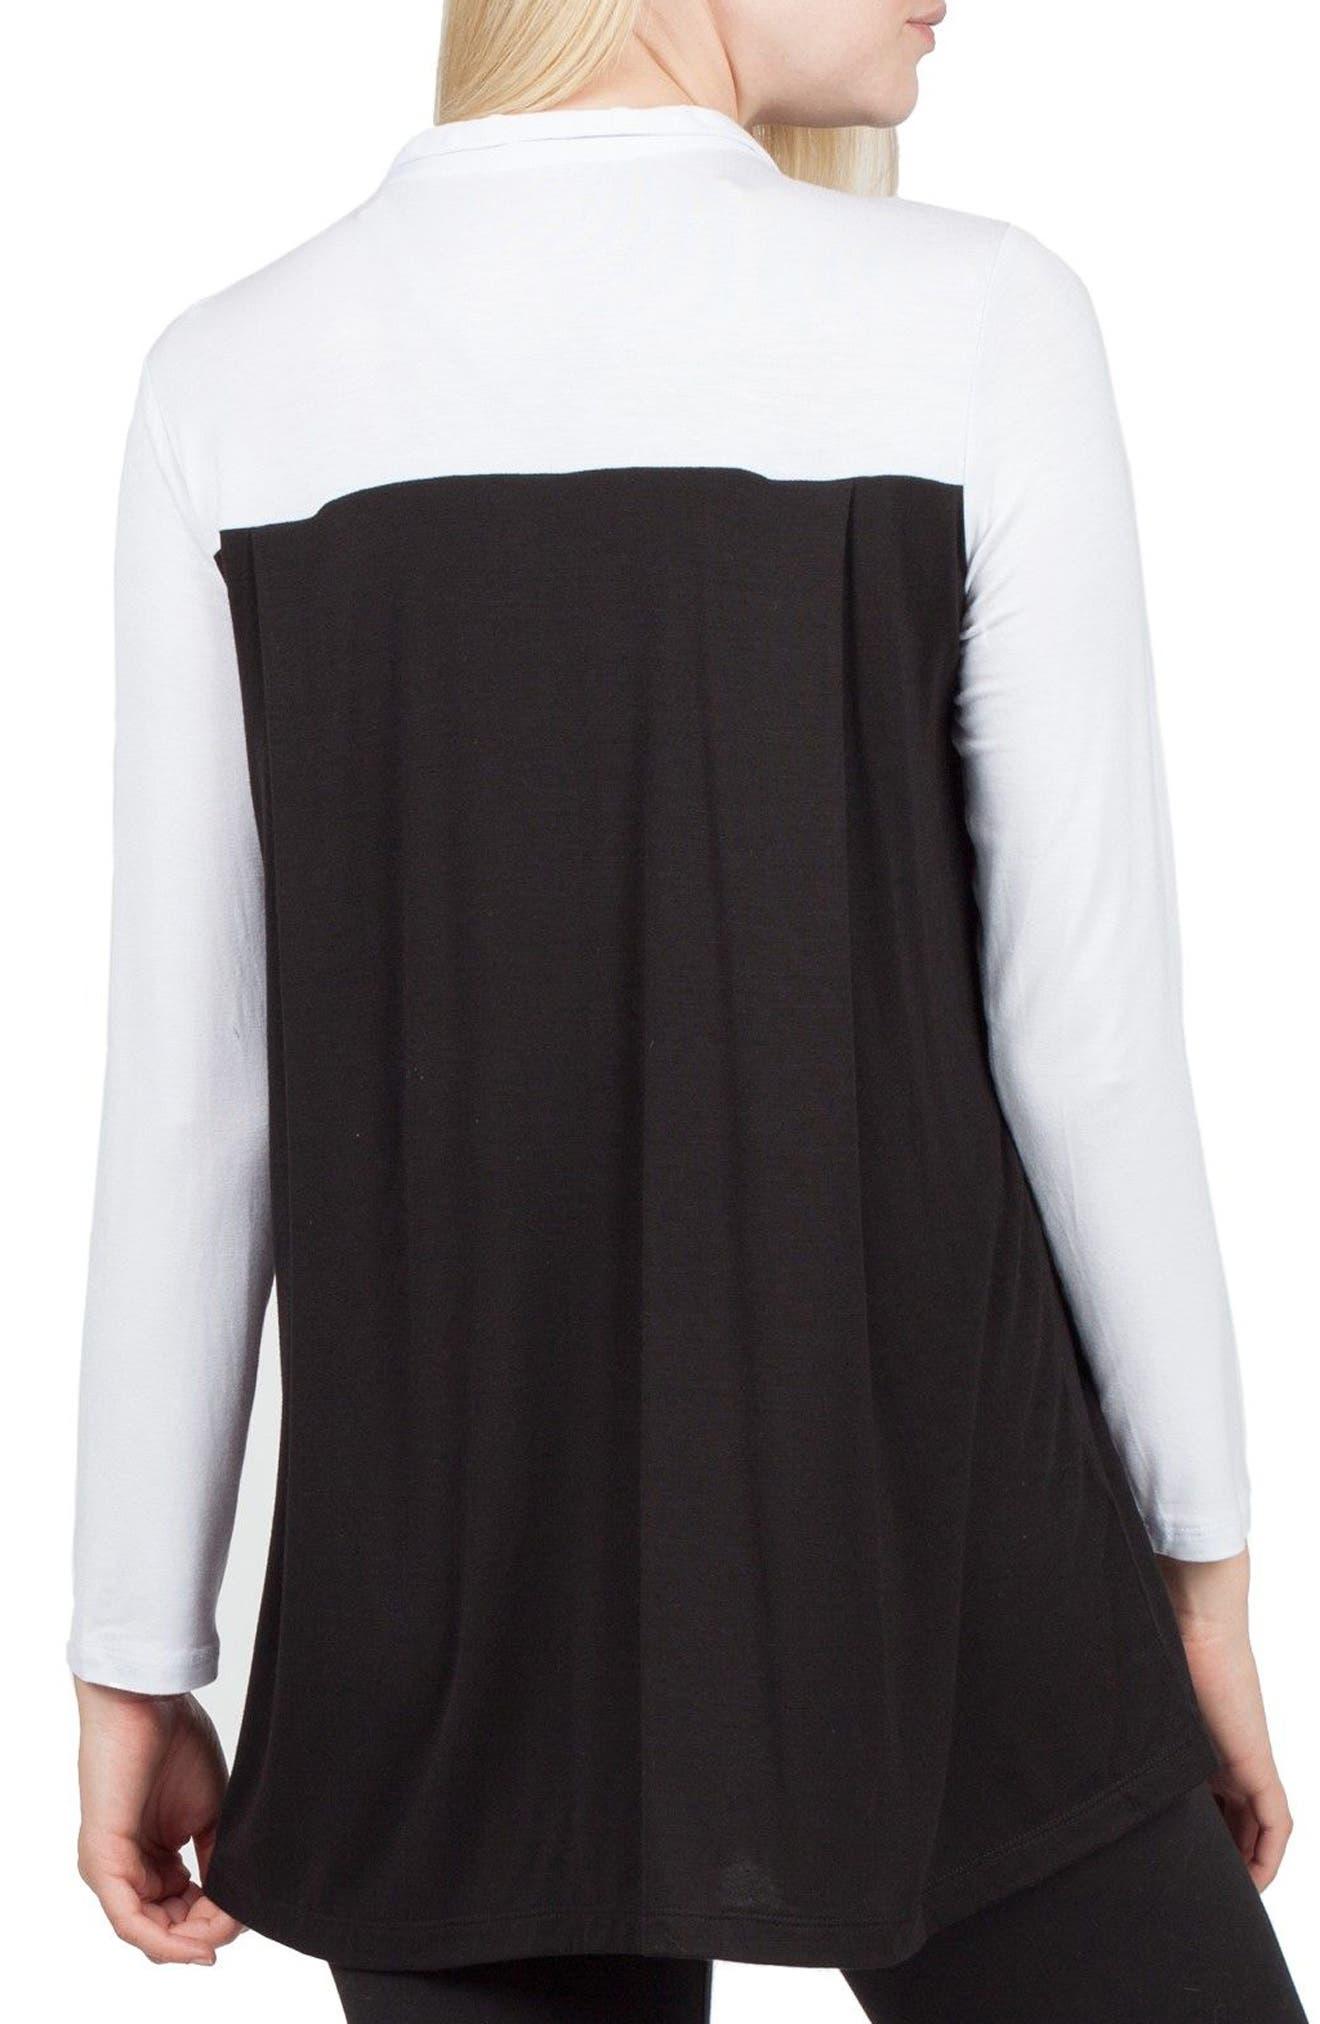 Berlin Colorblock Maternity/Nursing Tunic,                             Alternate thumbnail 2, color,                             Black/ White Contrast